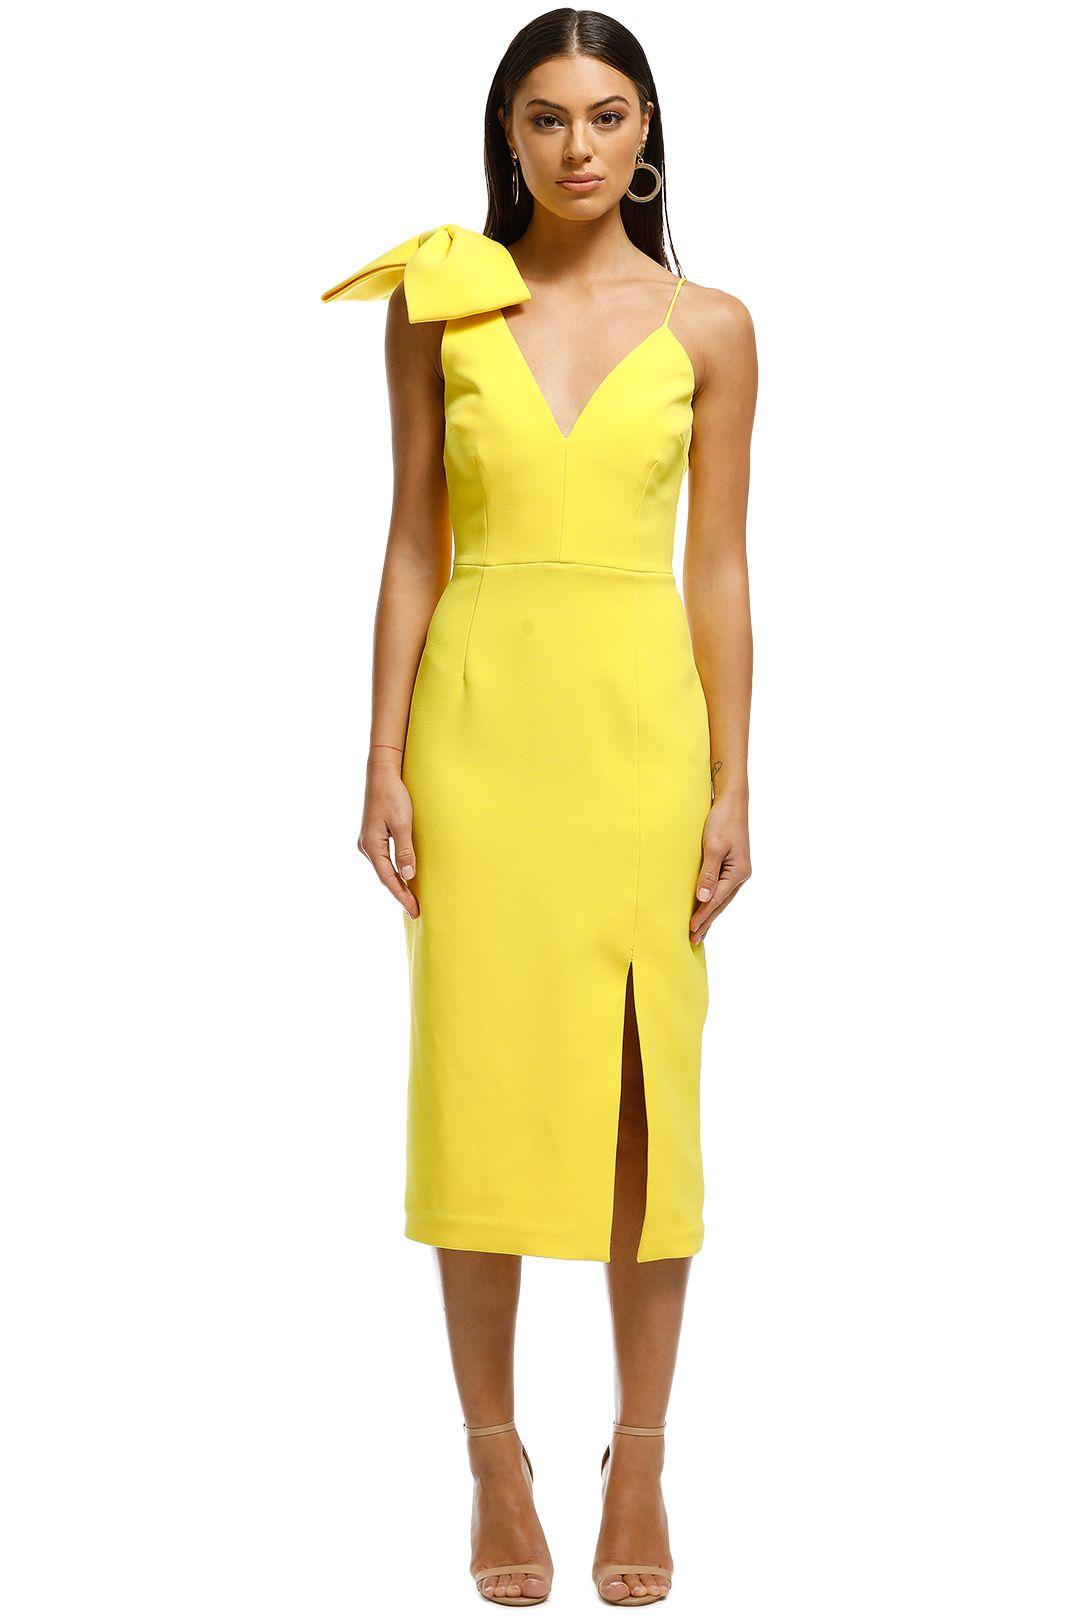 Rebecca Vallance - Love Bow Dress - Yellow - Front